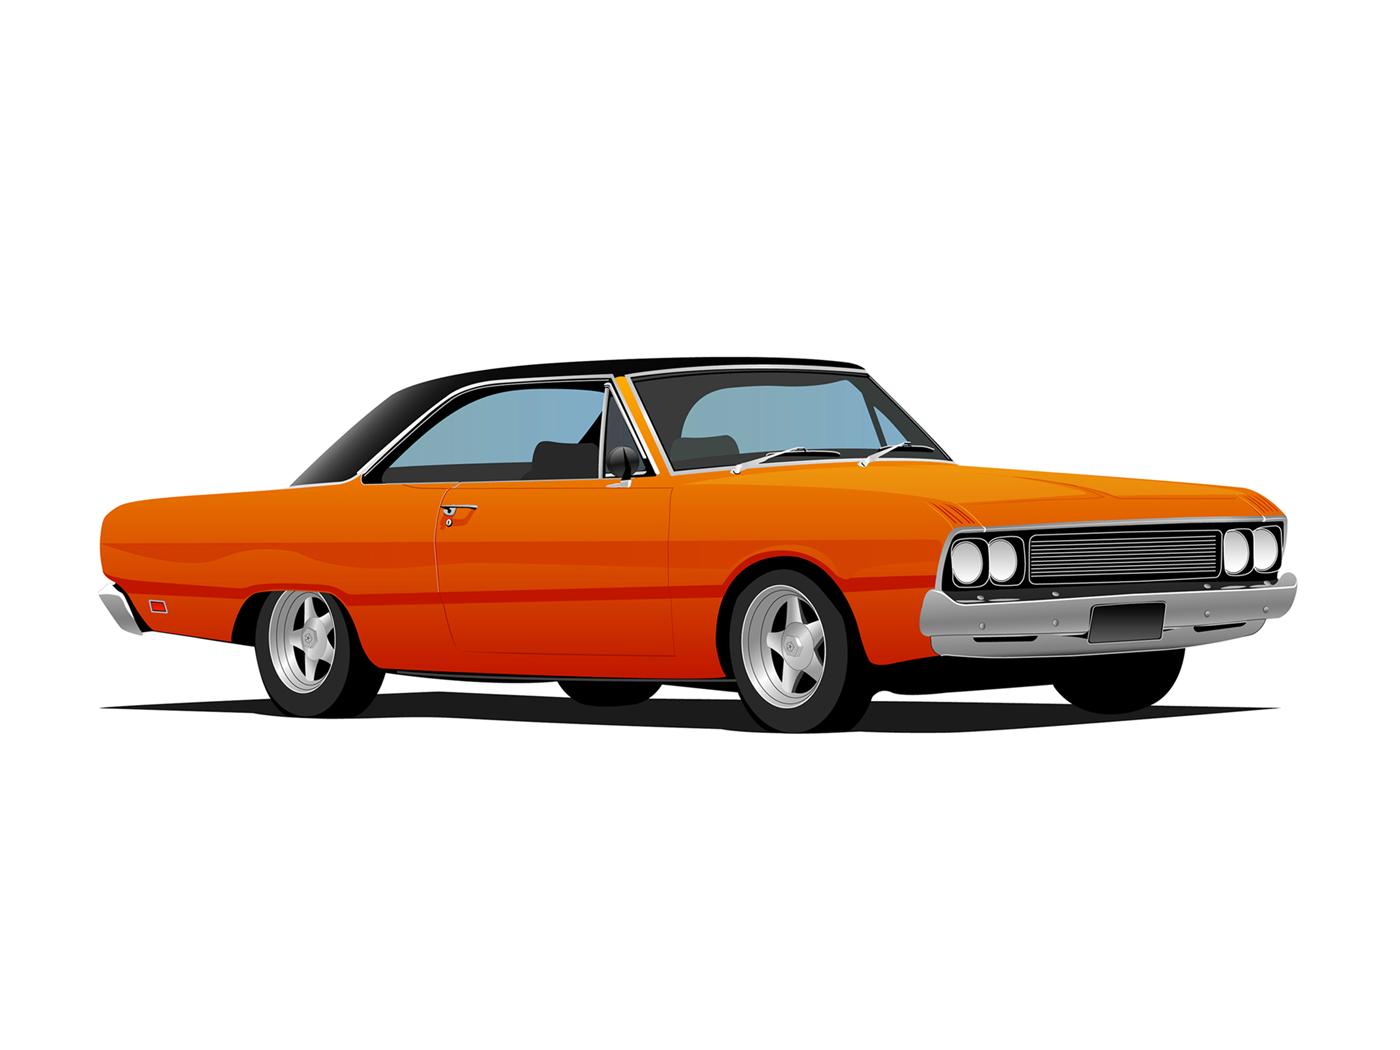 Remarkable Classic Muscle Car Desktop Wallpapers 1400 x 1050 263 kB 1400x1050